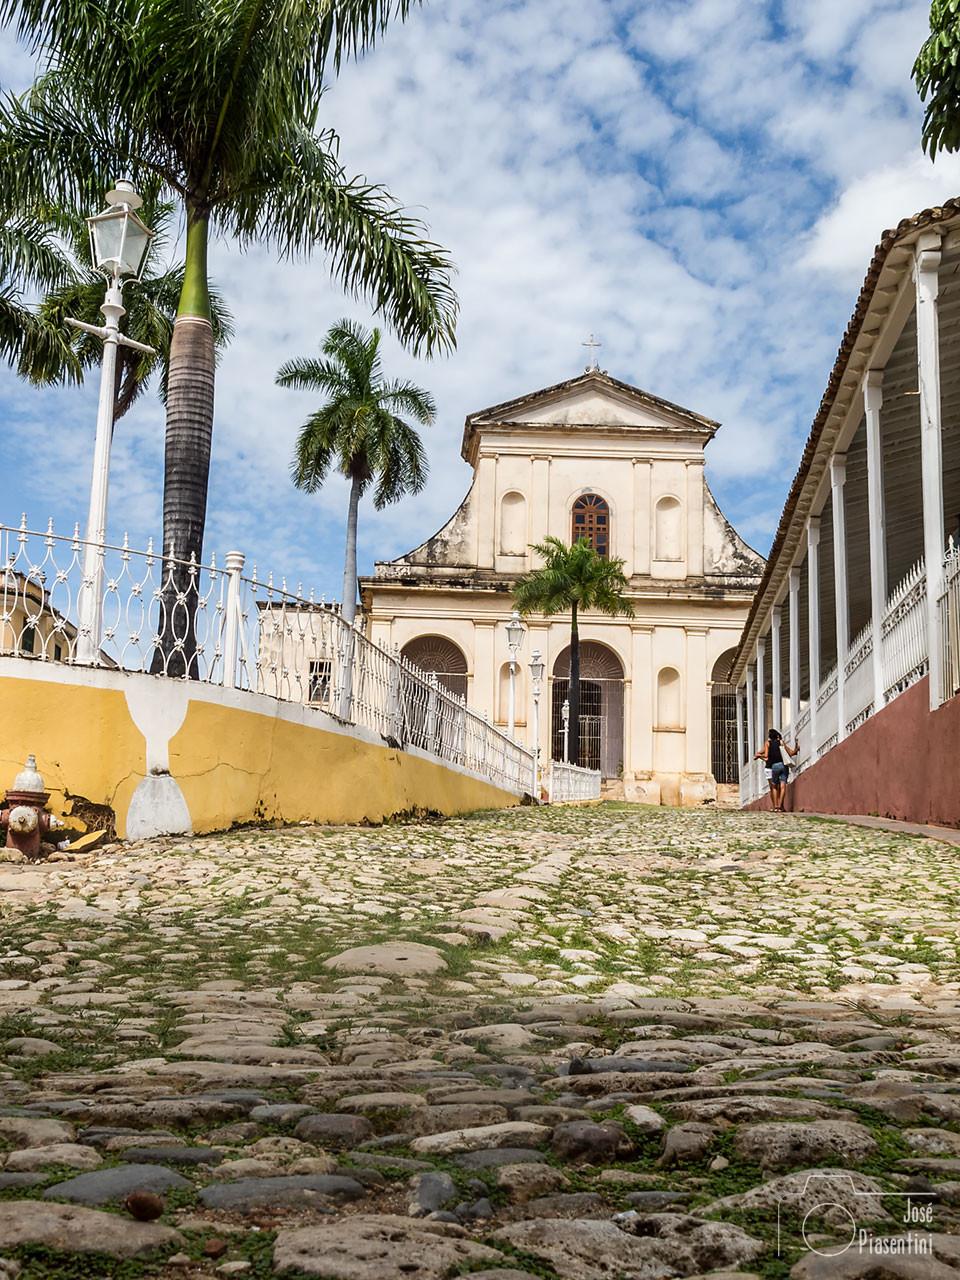 Casco antiguo de Trinidad Cuba - Family trip